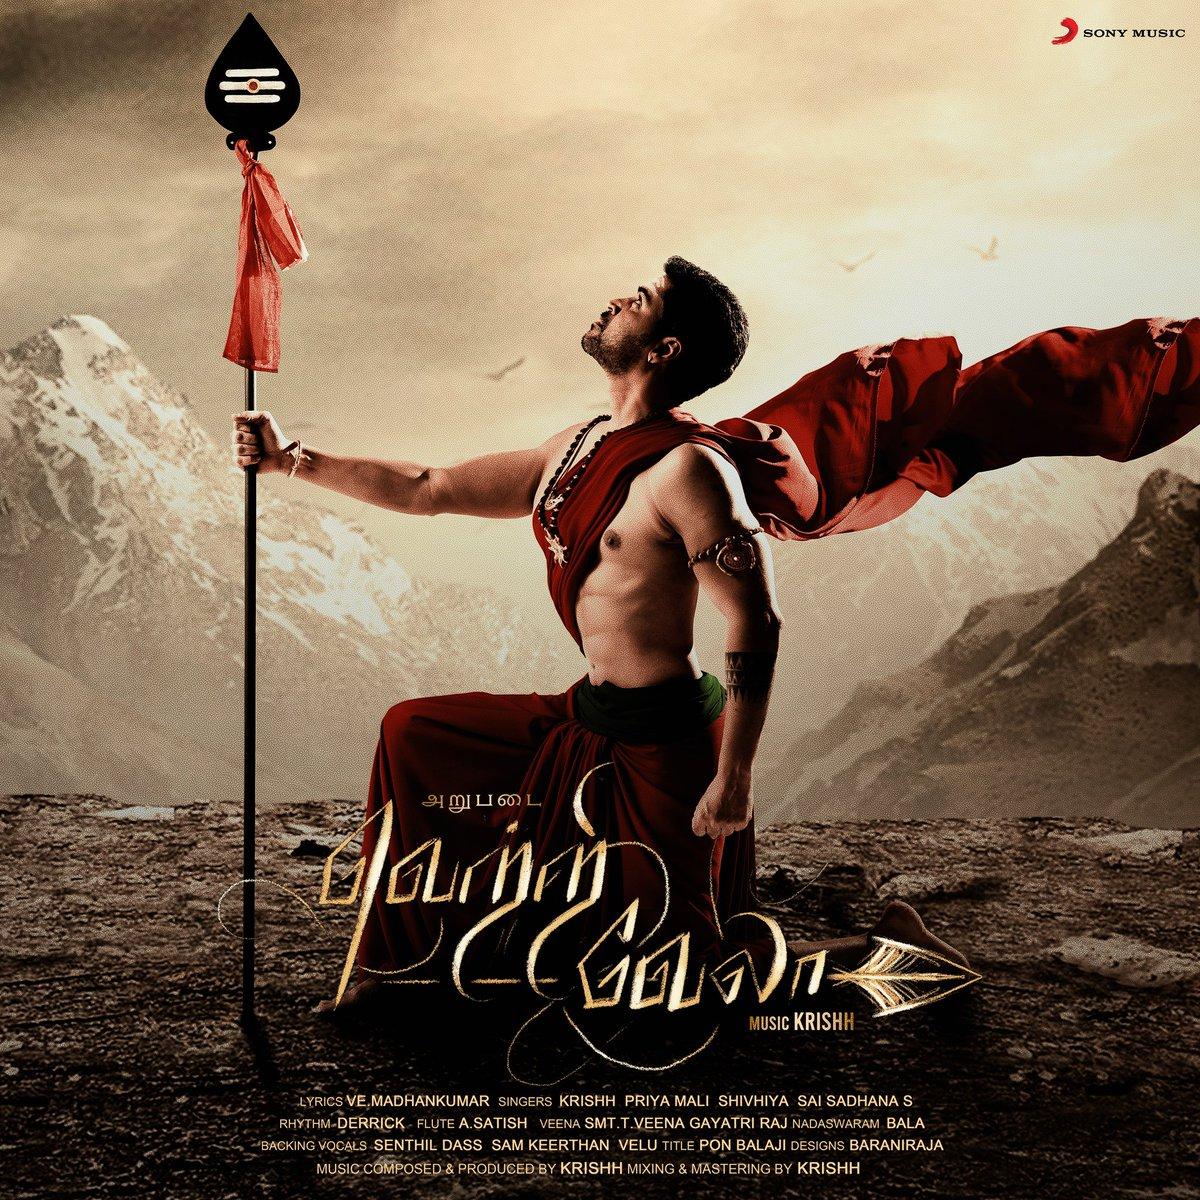 Here's #Vetrivela a devotional album of my good friend, actor, singer, music composer @krishoffl on @SonyMusicSouth  https://t.co/oDXk2BIaHc  Congratulations! @kavingarmadhan @thisispriyamali @sirajkhan_skp  @barani_offl  @balaji_indian #வெற்றிவேலா https://t.co/1U80dM4oqN